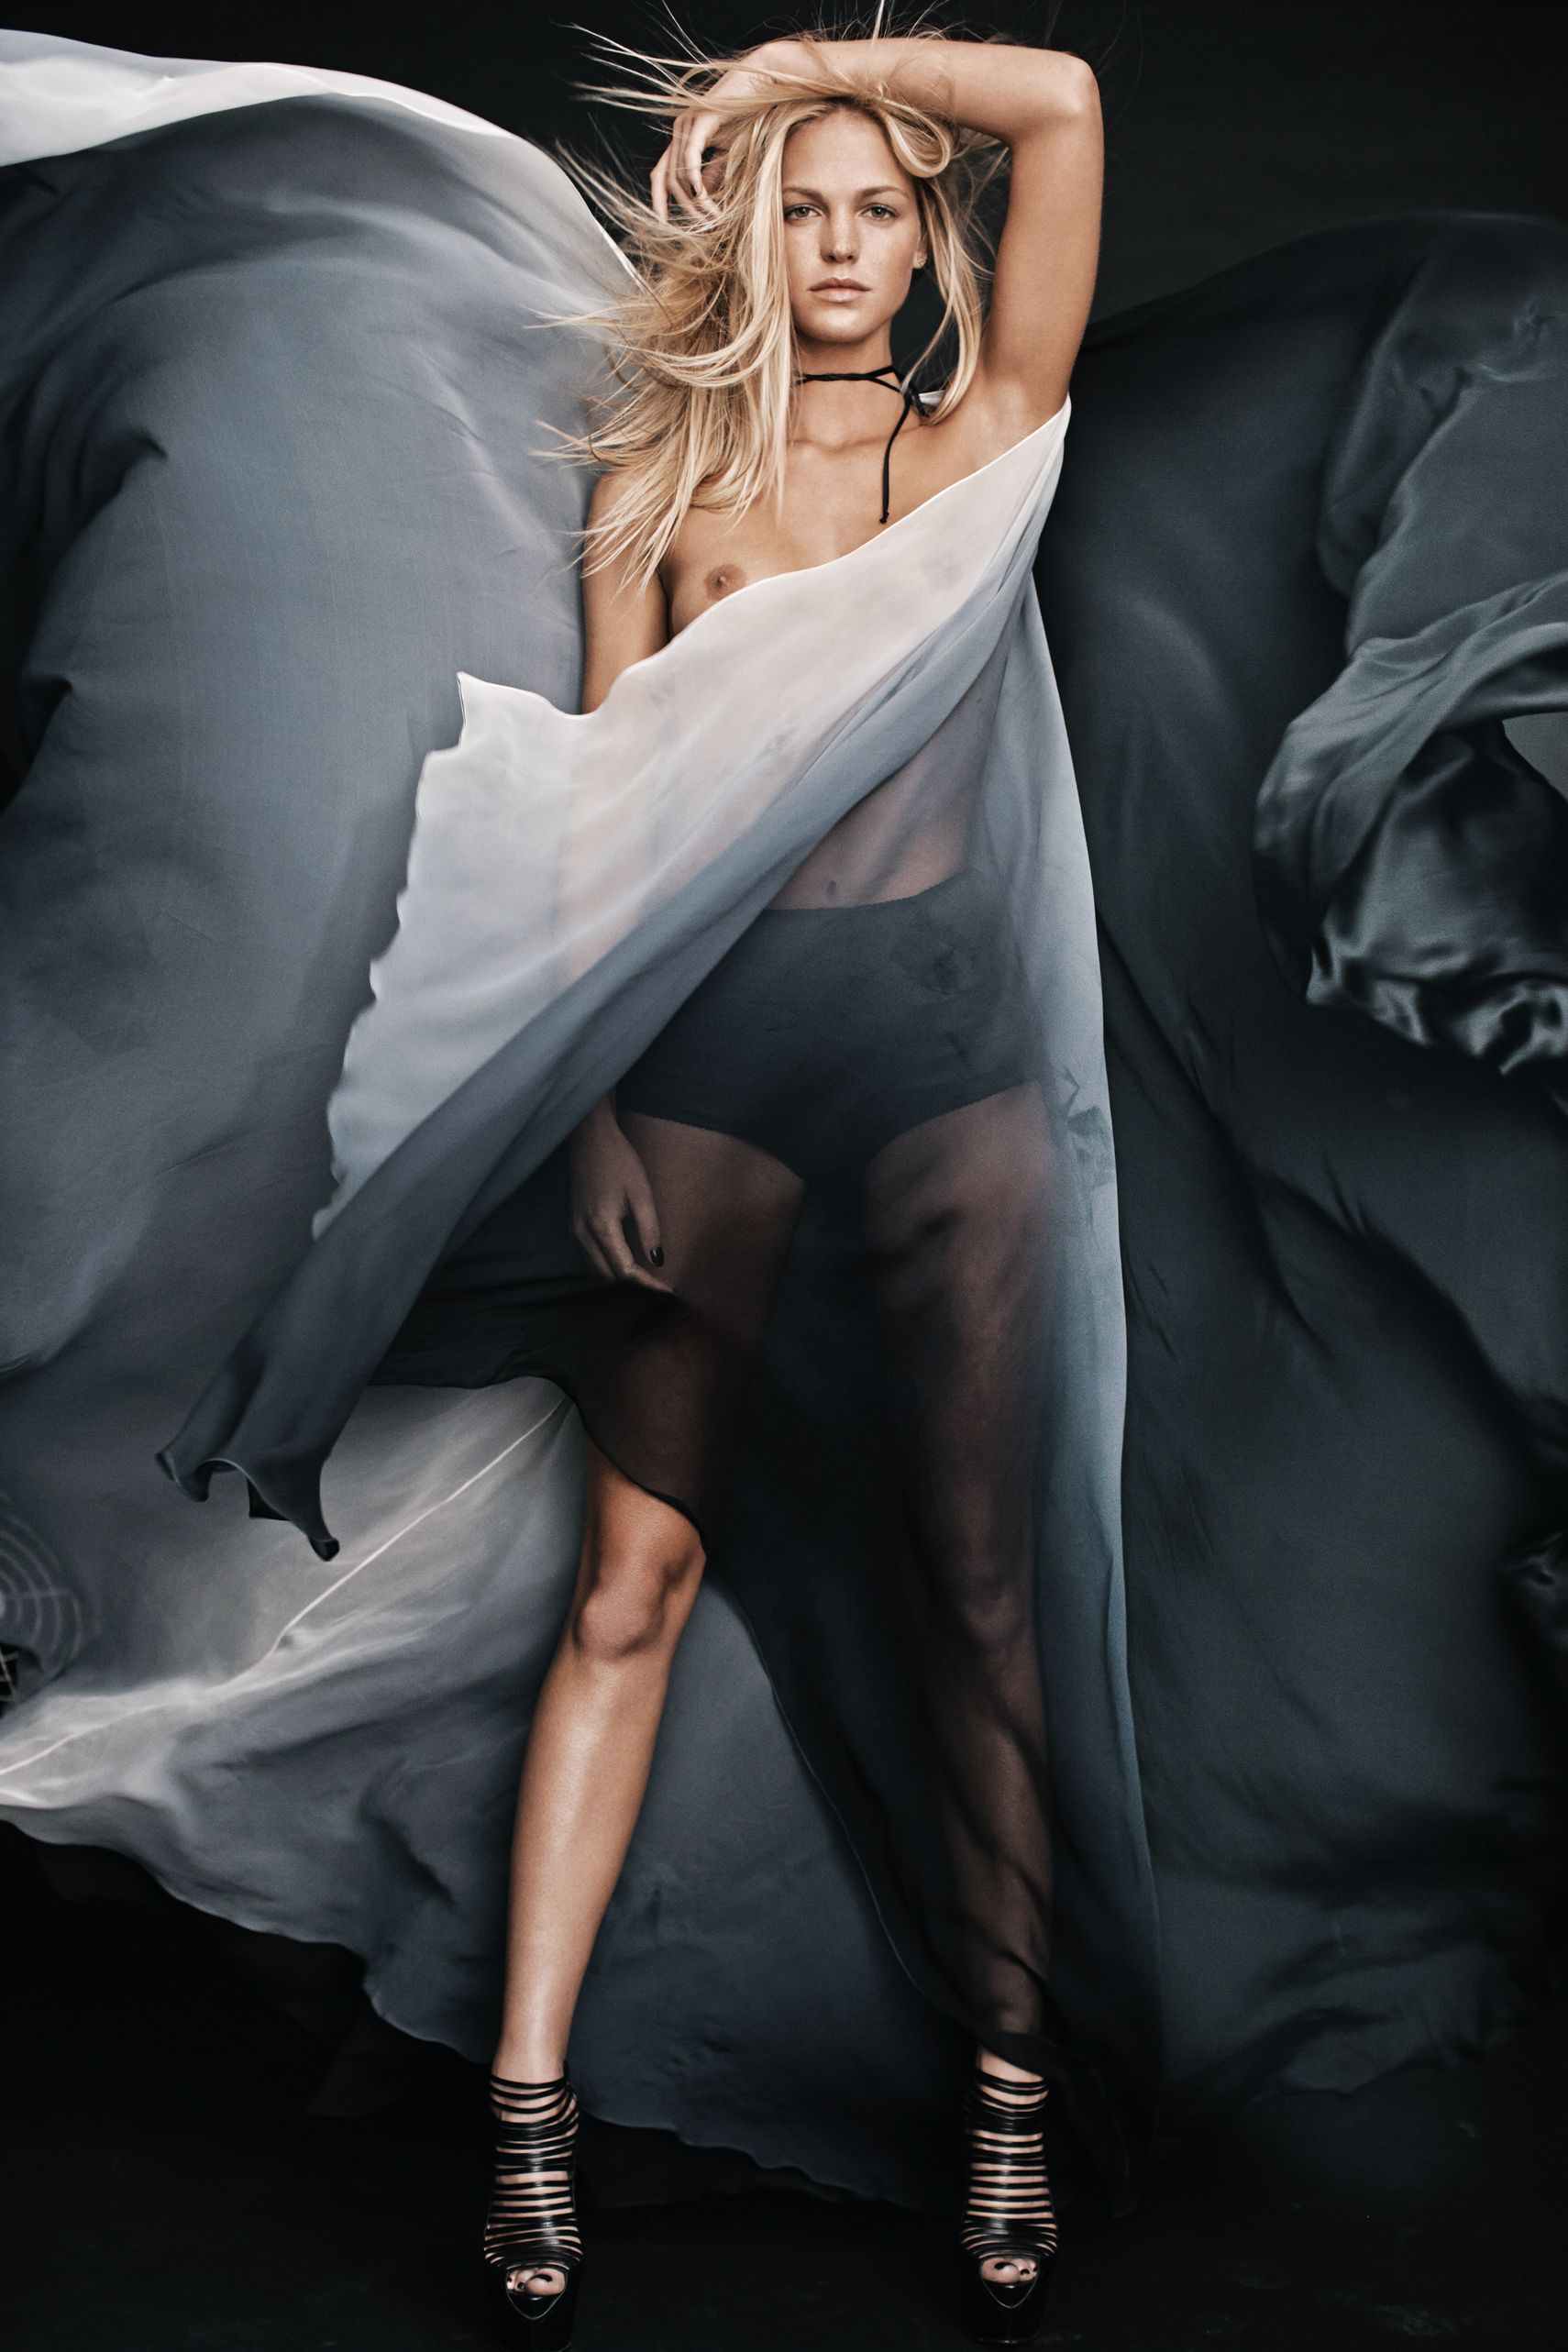 Finest Erin James Nudes Scenes